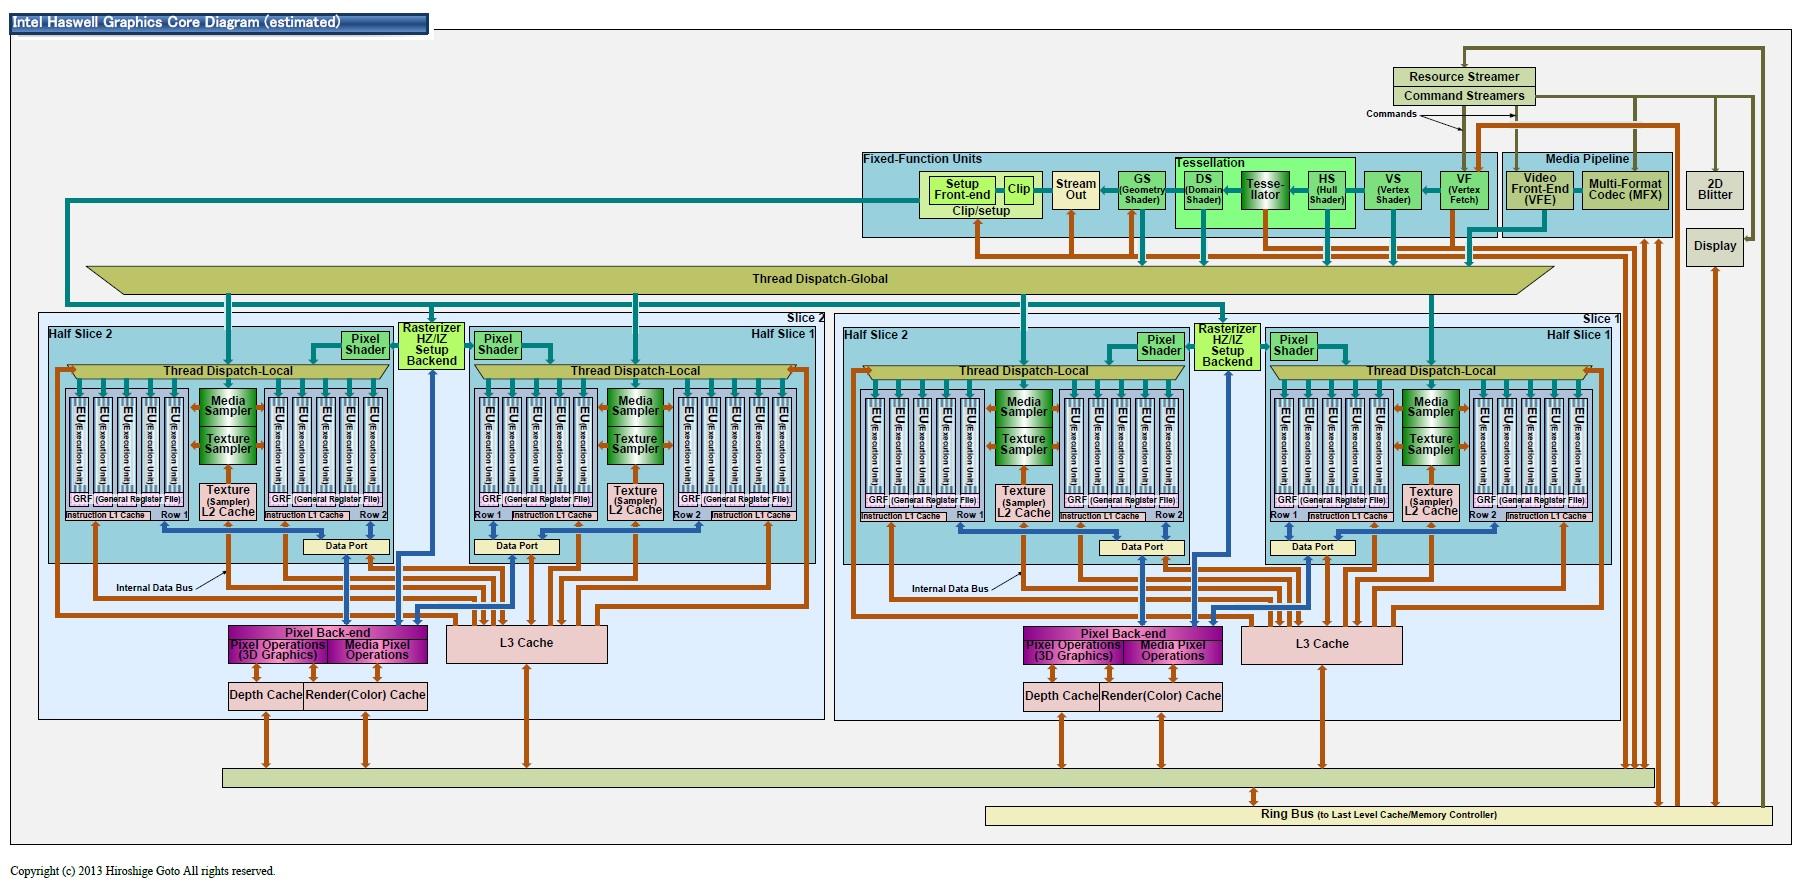 "Haswellのグラフィックス推定図(PDF版は<span class=""img-inline raw""><a href=""/video/pcw/docs/598/286/p15.pdf"" ipw_status=""1"" ipw_linktype=""filelink_raw"" class=""resource"">こちら</a></span>)"